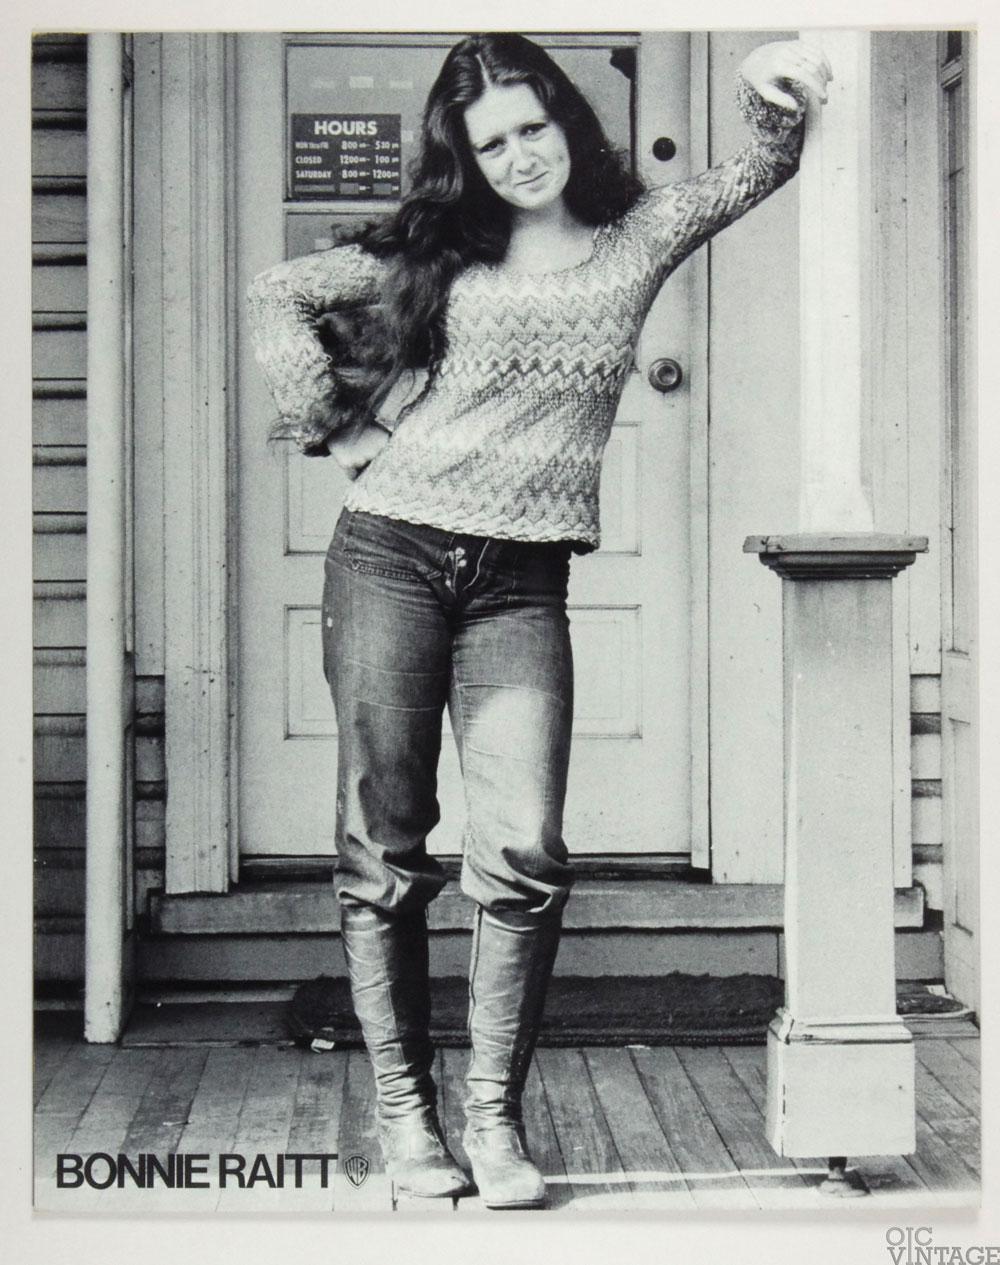 Bonnie Raitt Poster Cardboard 1971 Bonnie Raitt Debut Album Promo  B/W